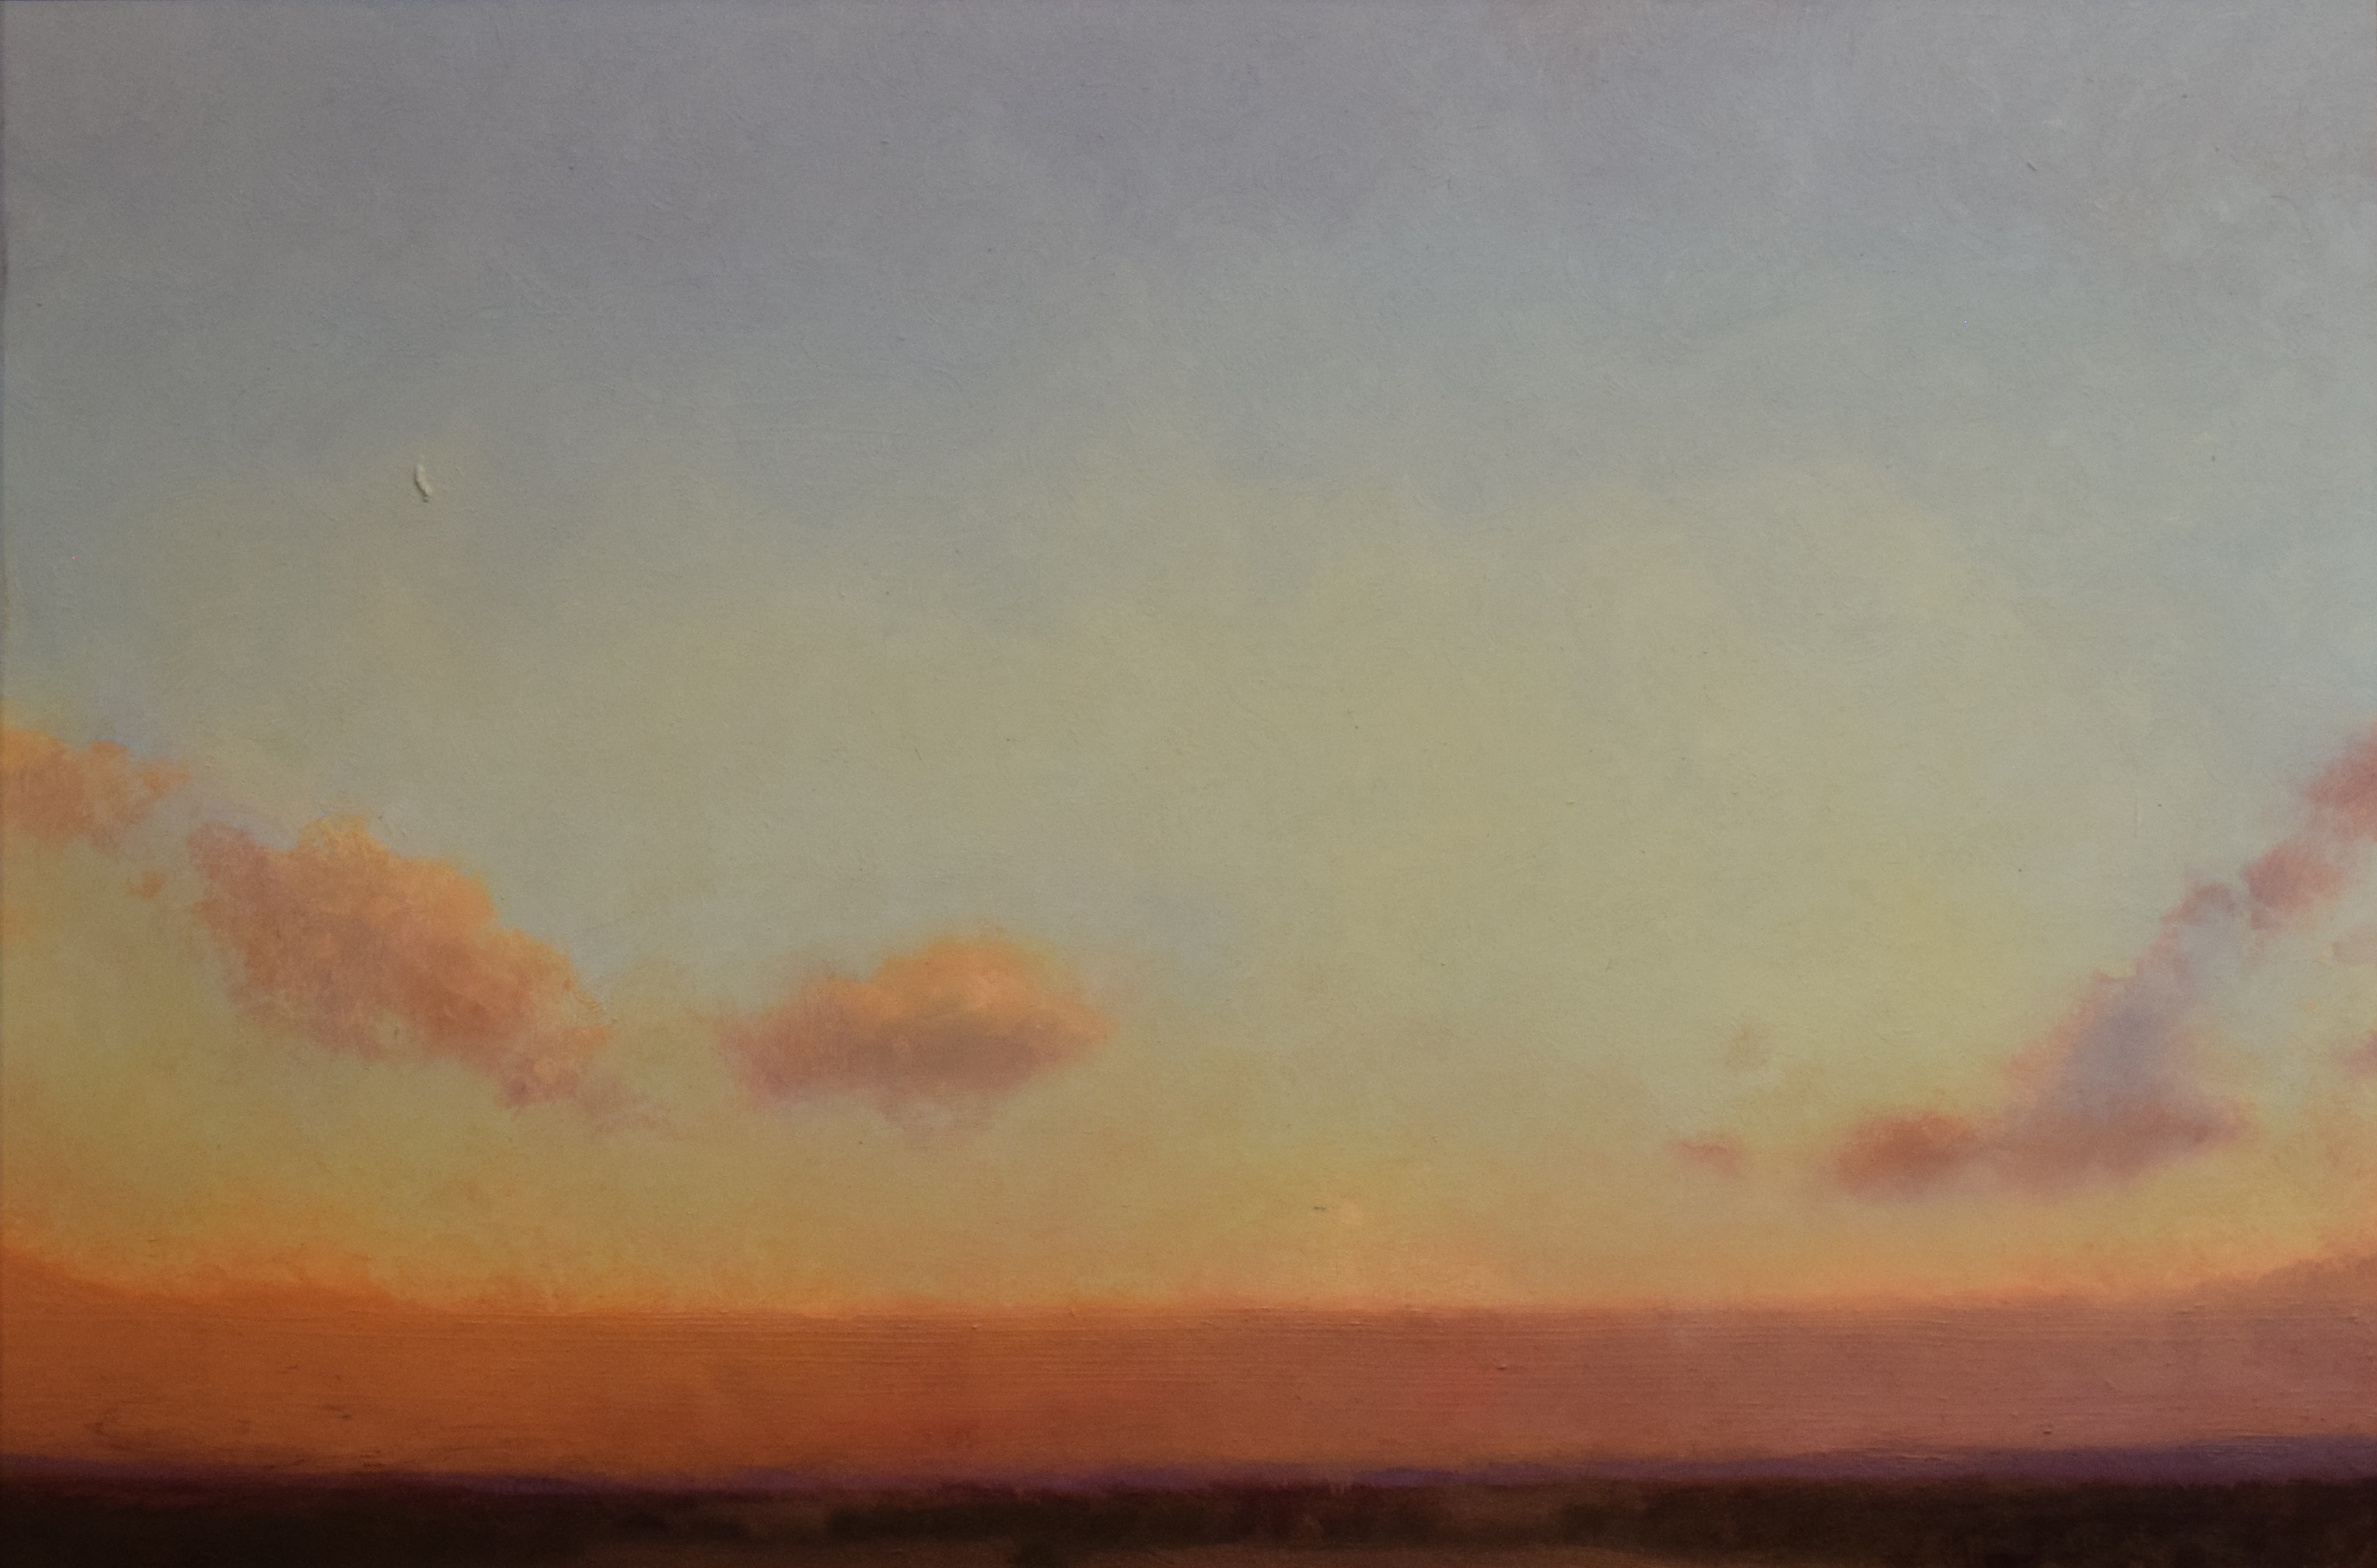 Sunset Series #3